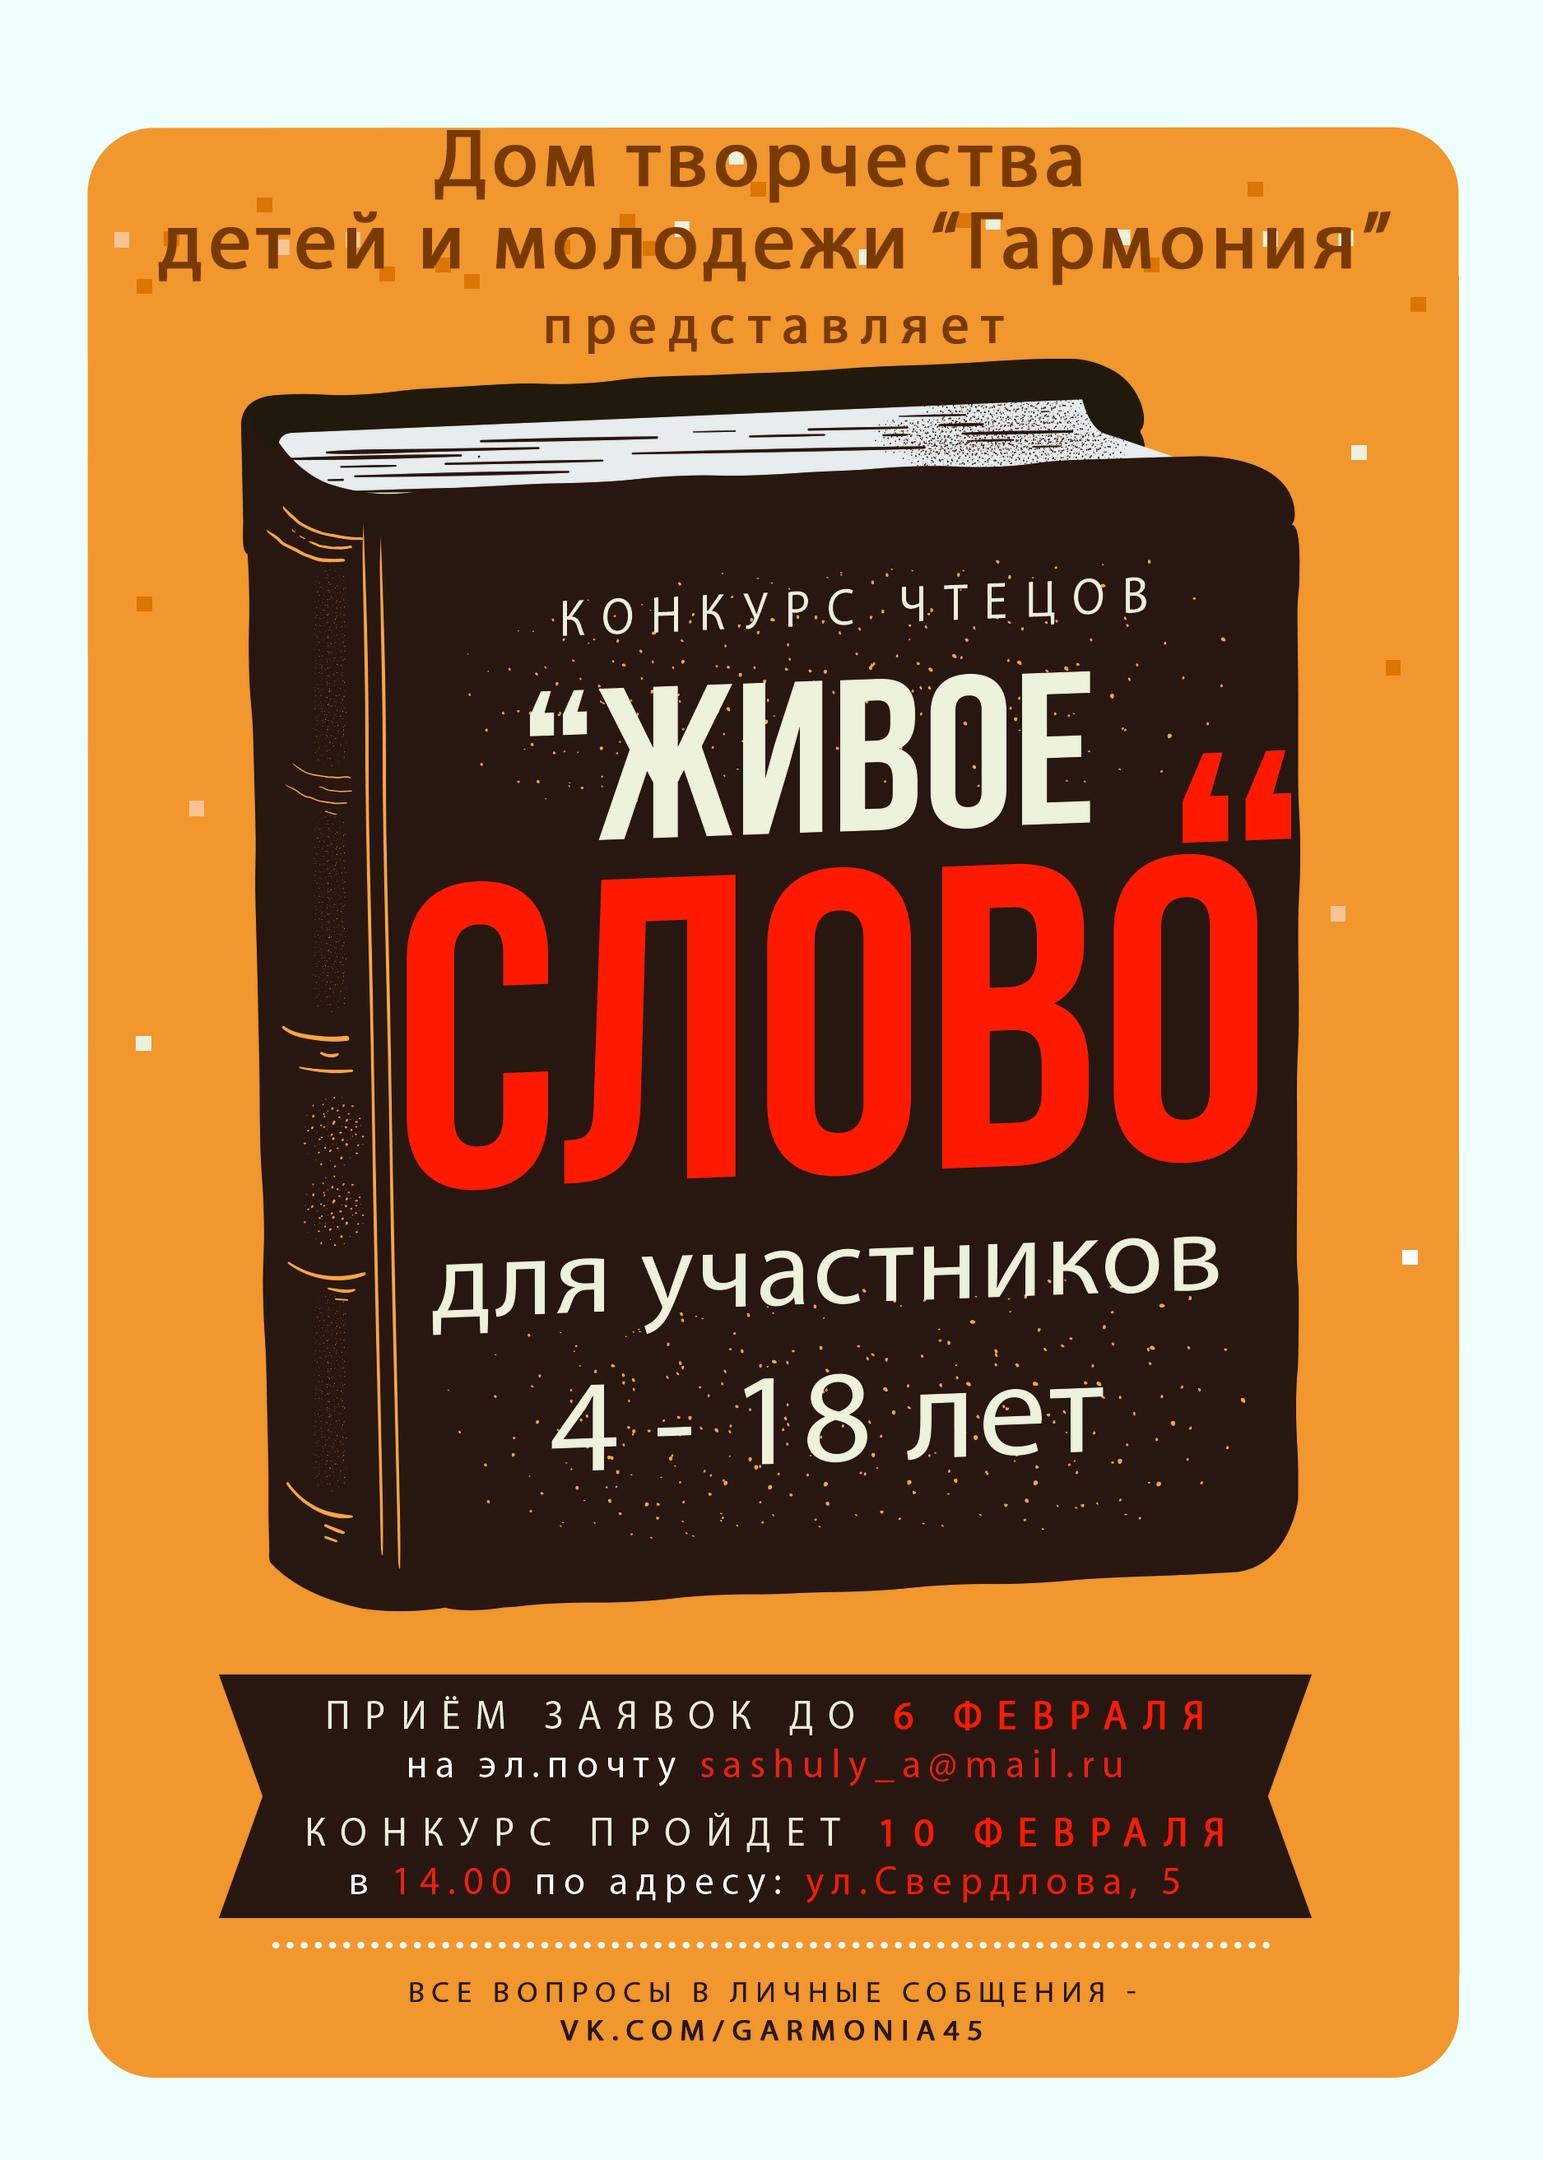 Конкурс чтецов Живое слово - 2019 курган афиша расписание